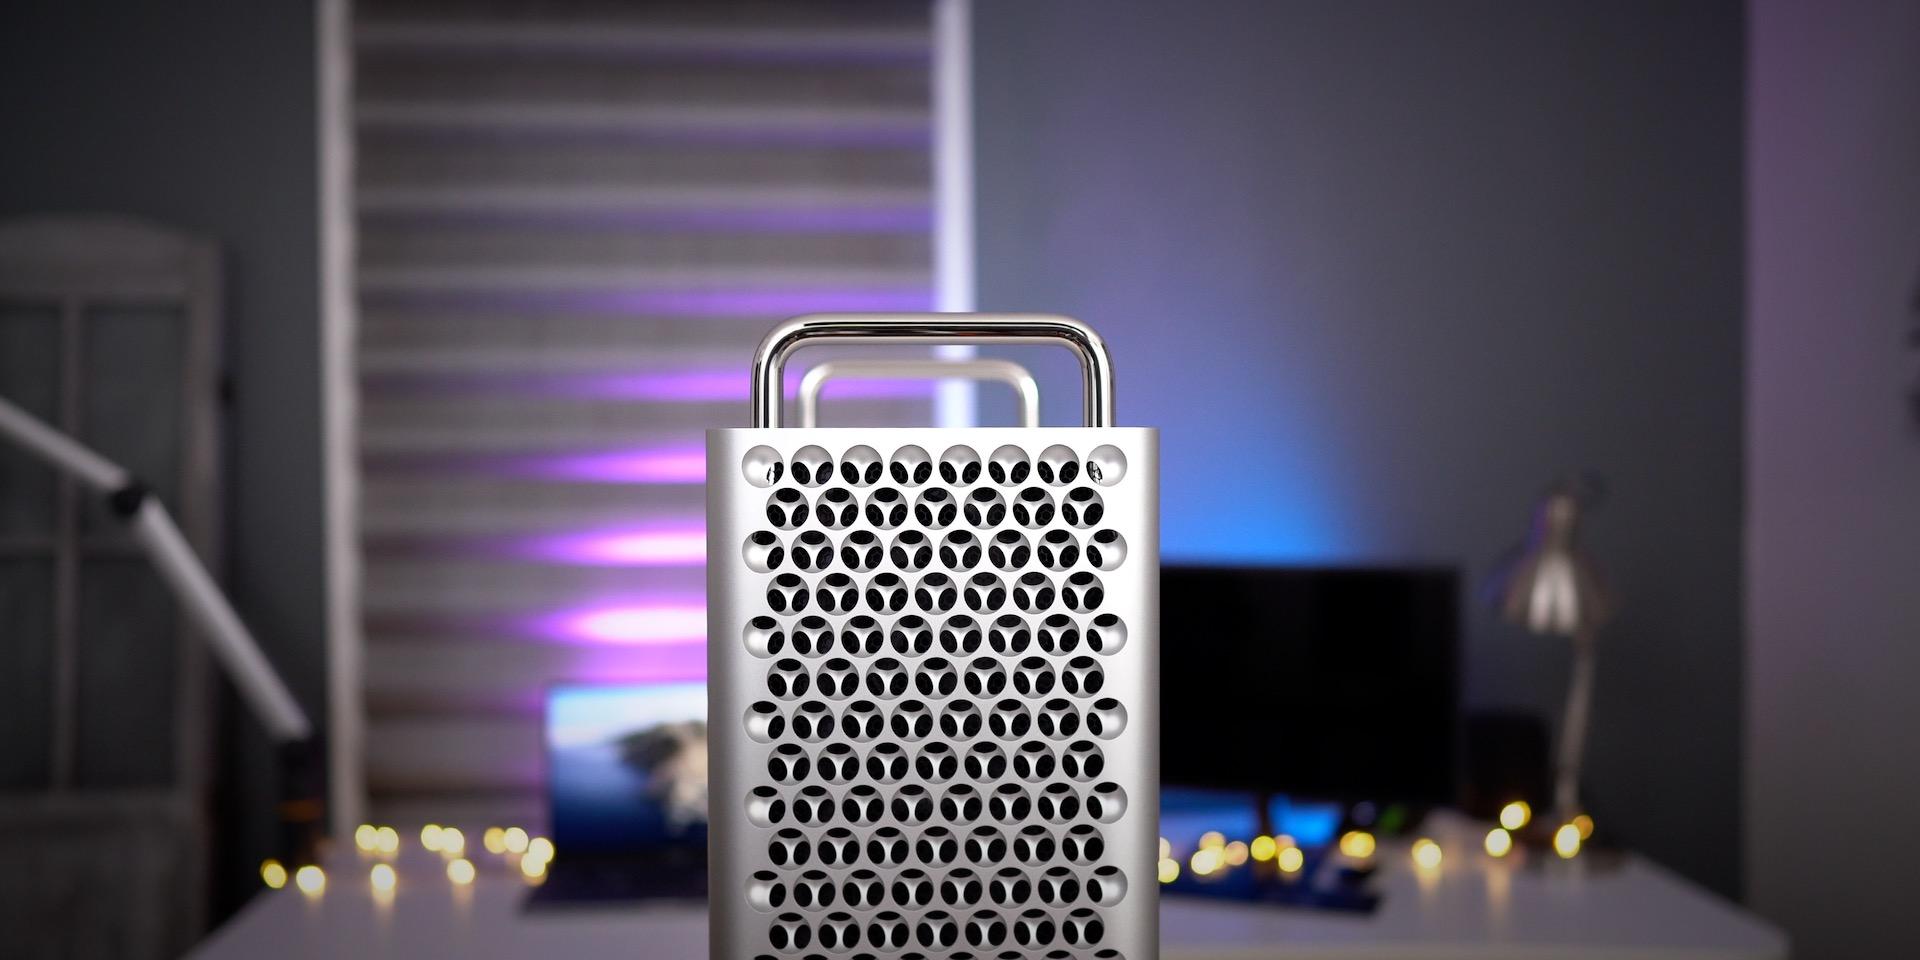 Mac Pro lattice pattern